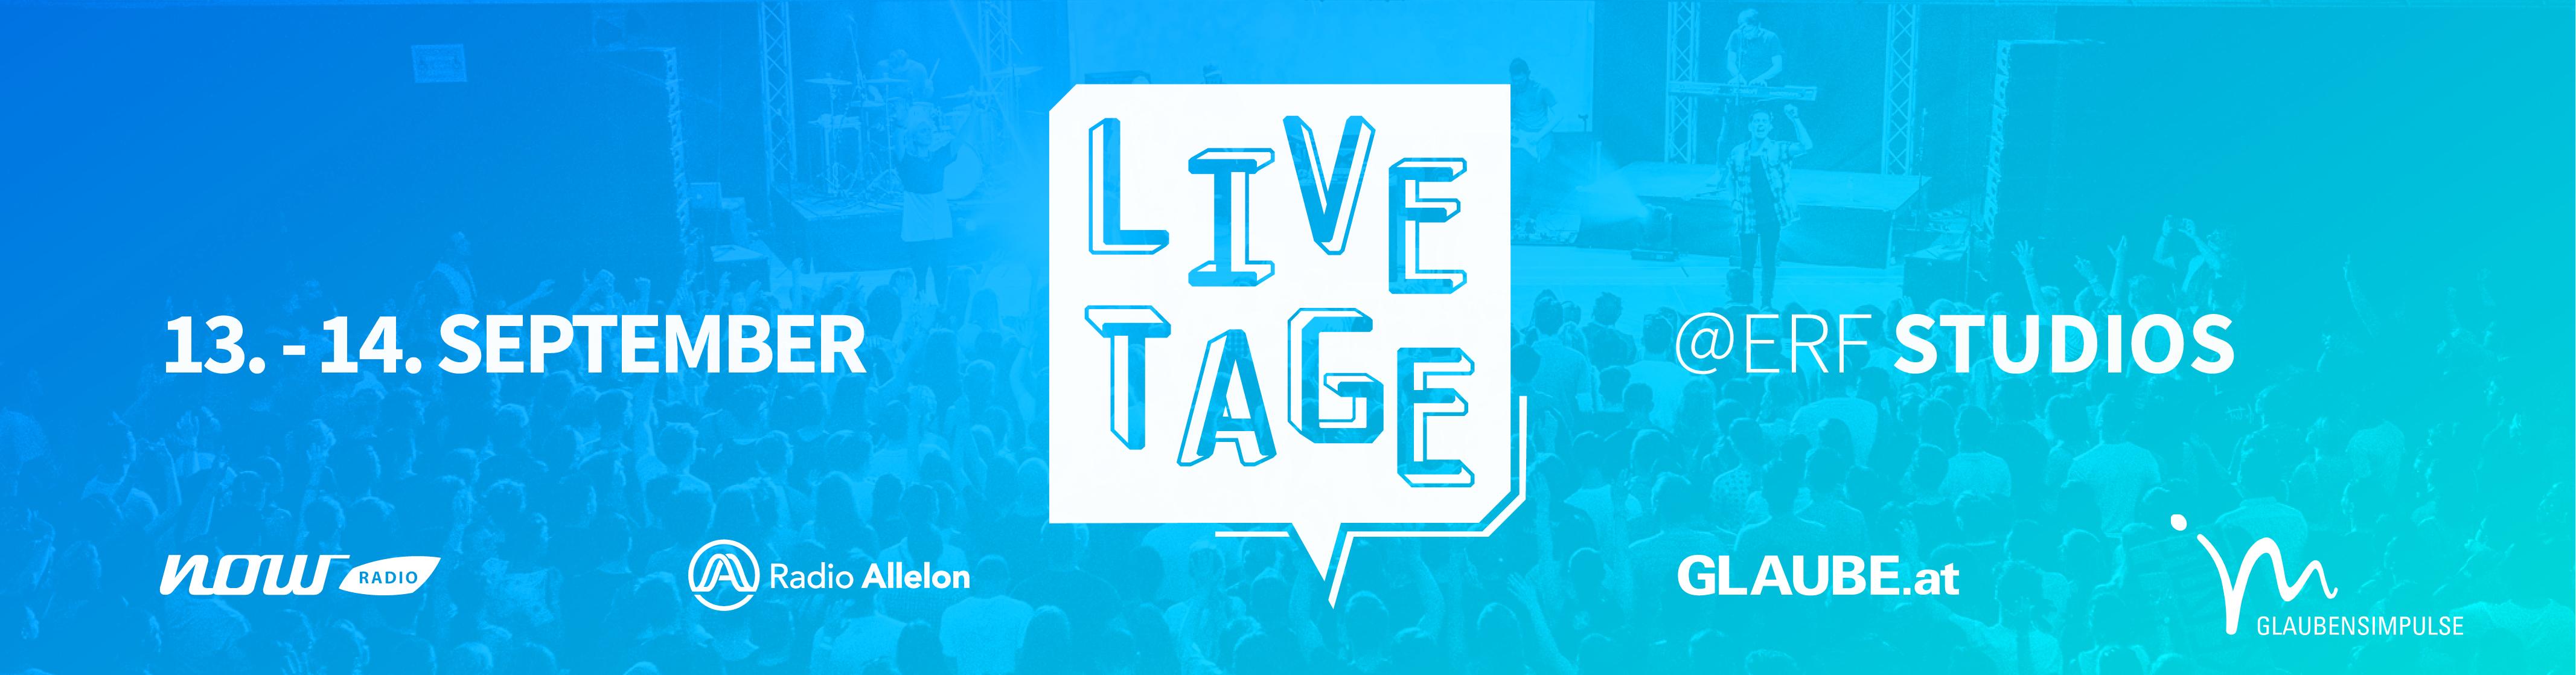 LIVE TAGE